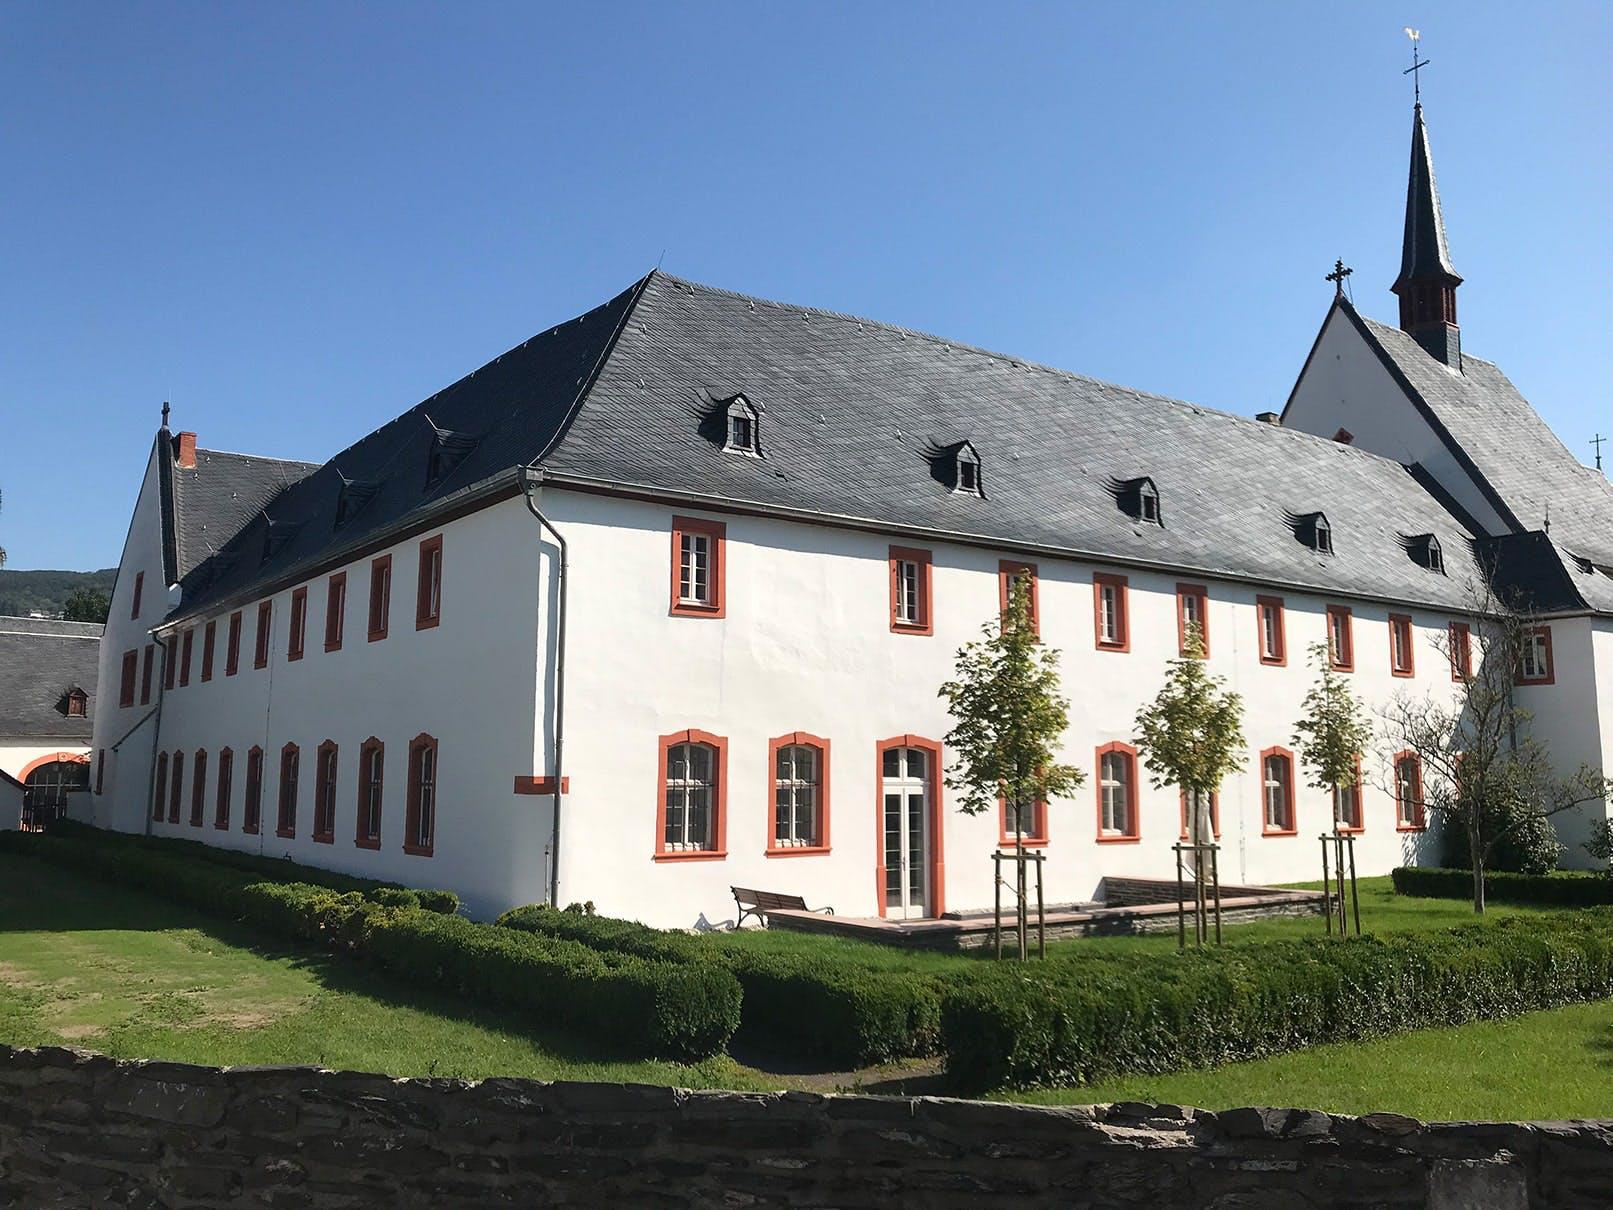 Cusanus-Hospital in Bernkastel-Kues